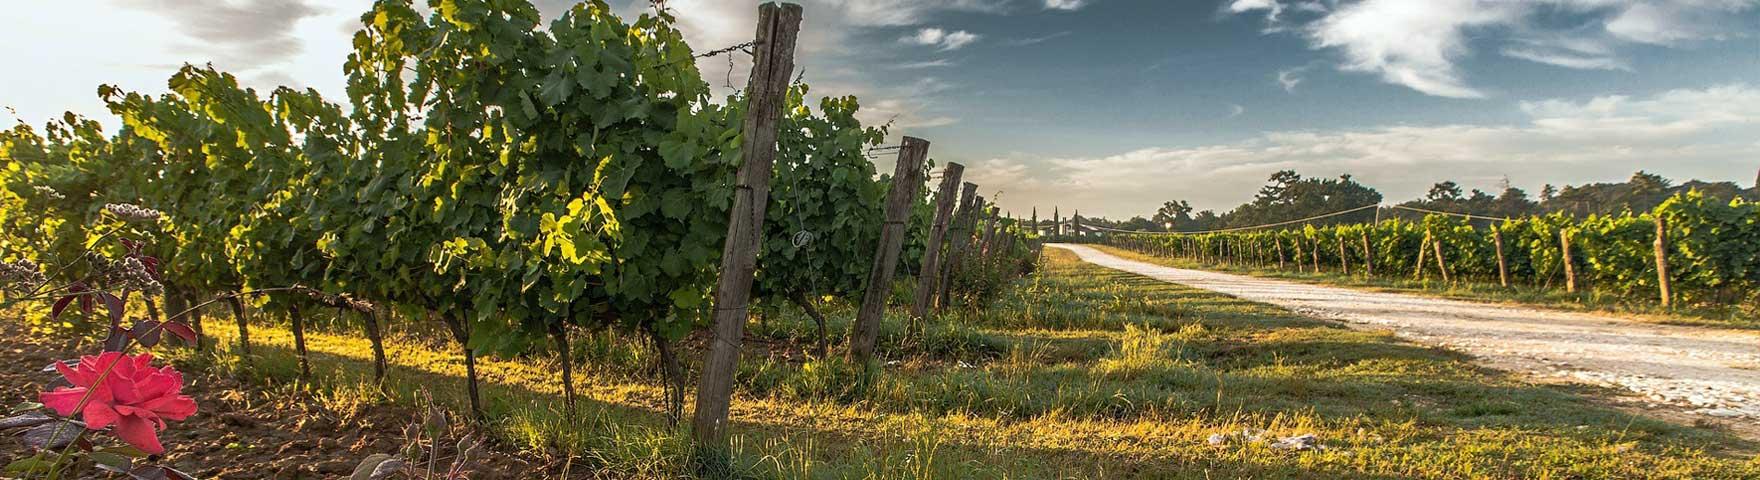 Ockenheim, der Weinort am St. Jakobsberg